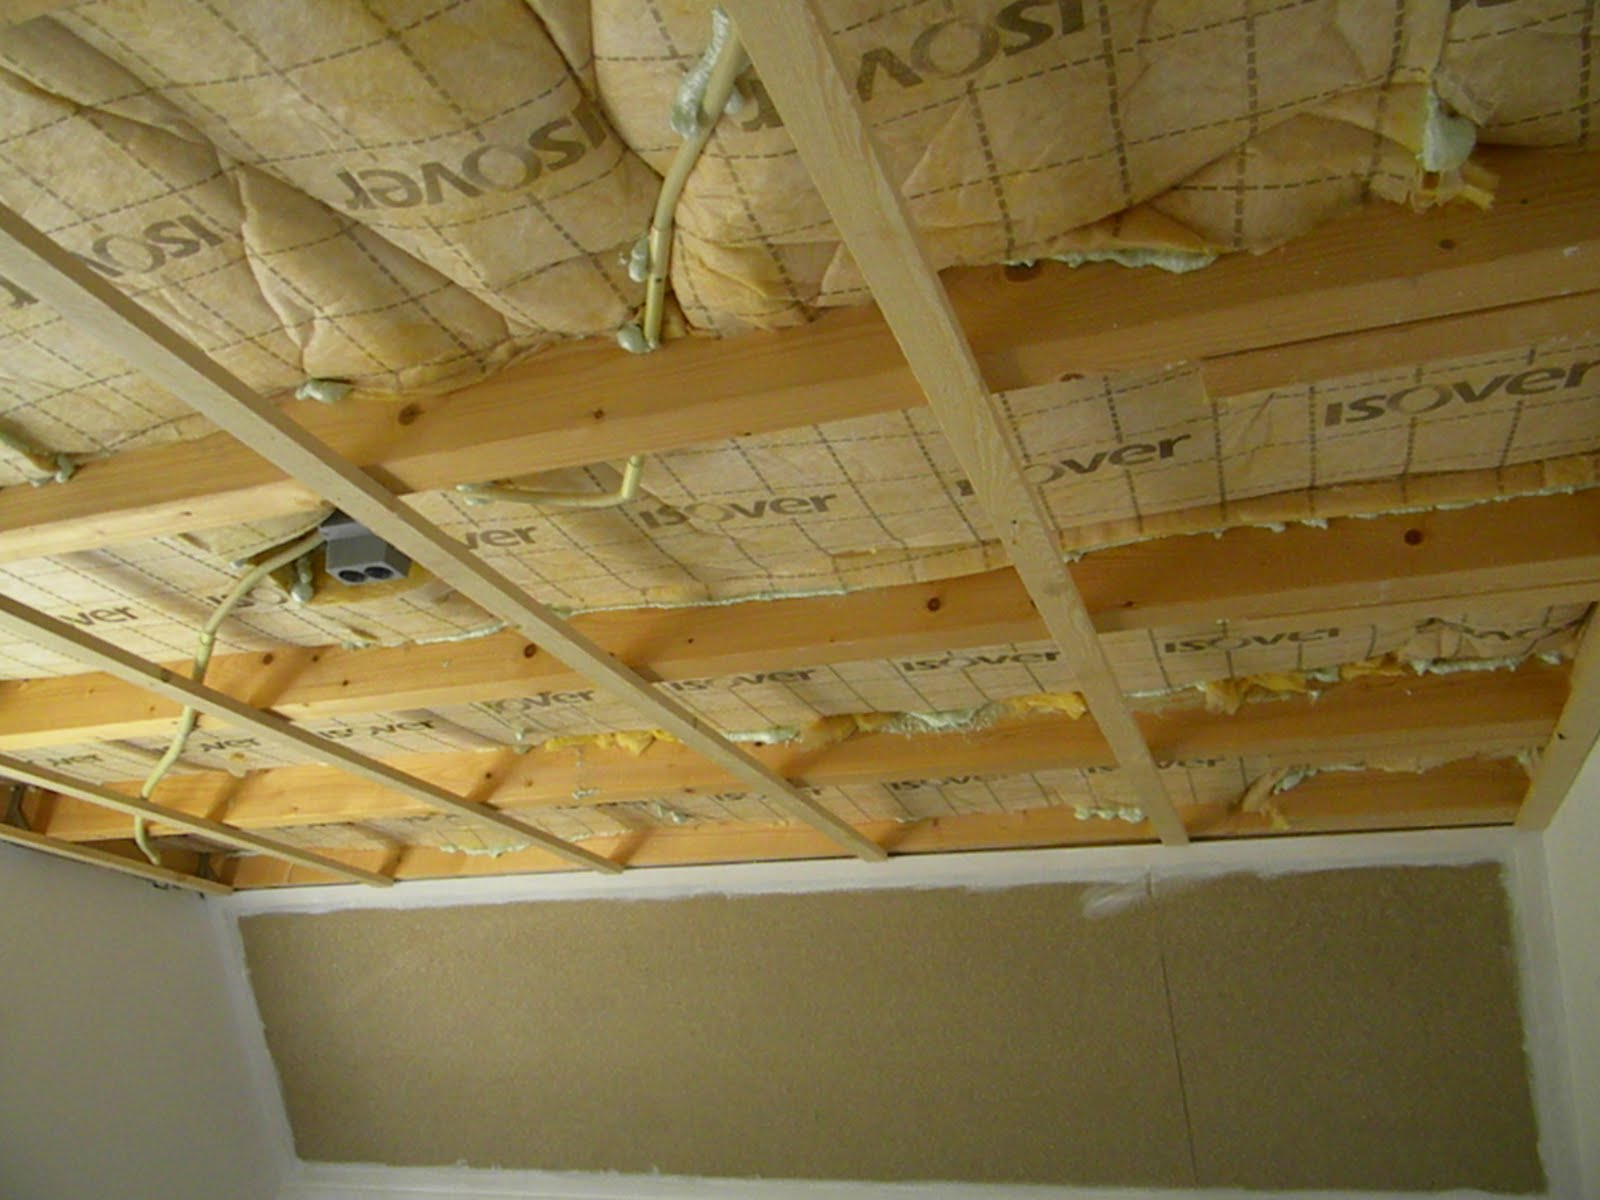 Isolatie Slaapkamer Plafond